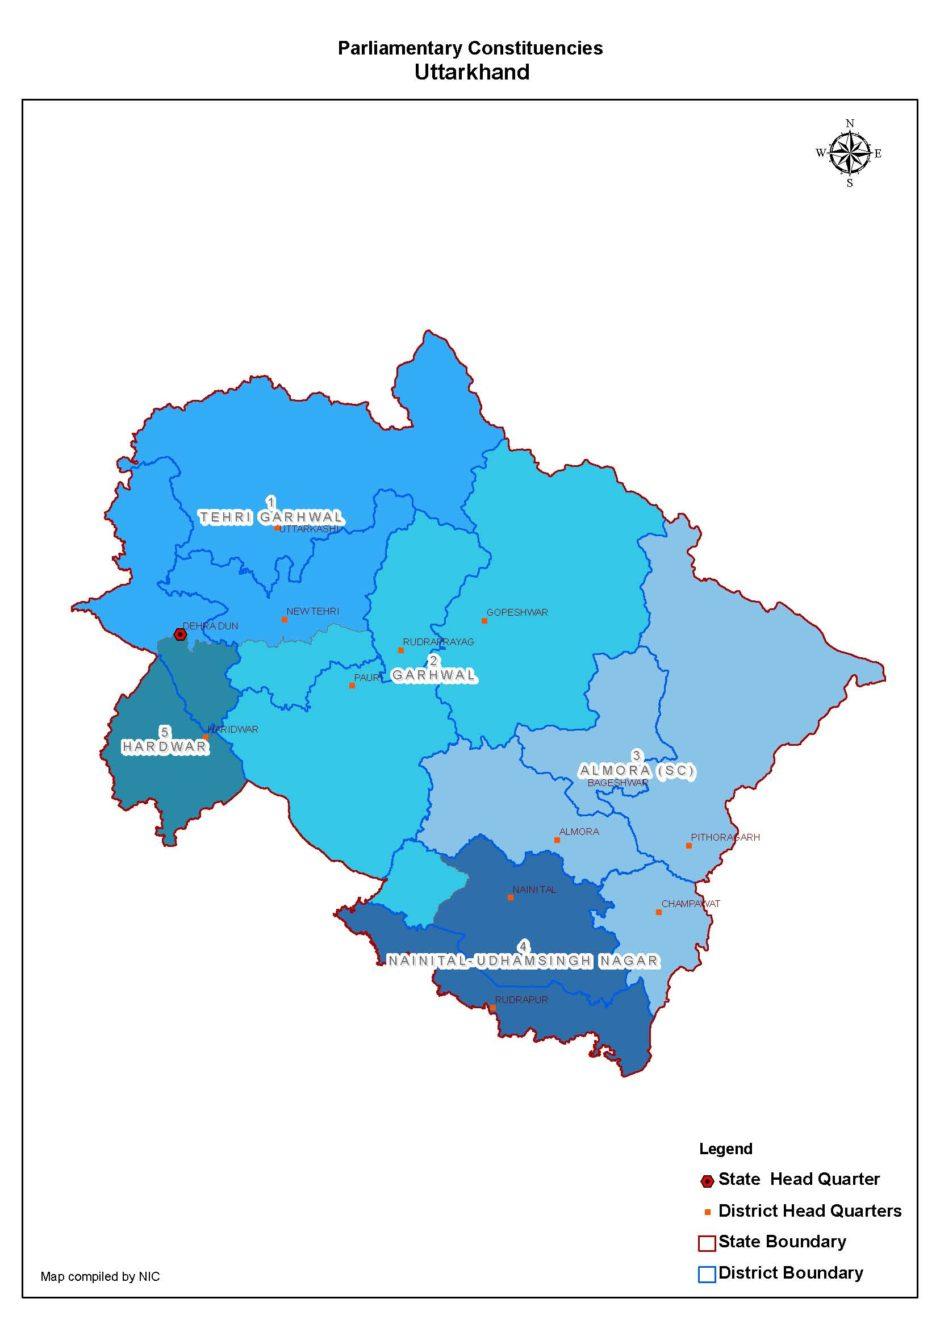 Indian general election in Uttarakhand – 2019